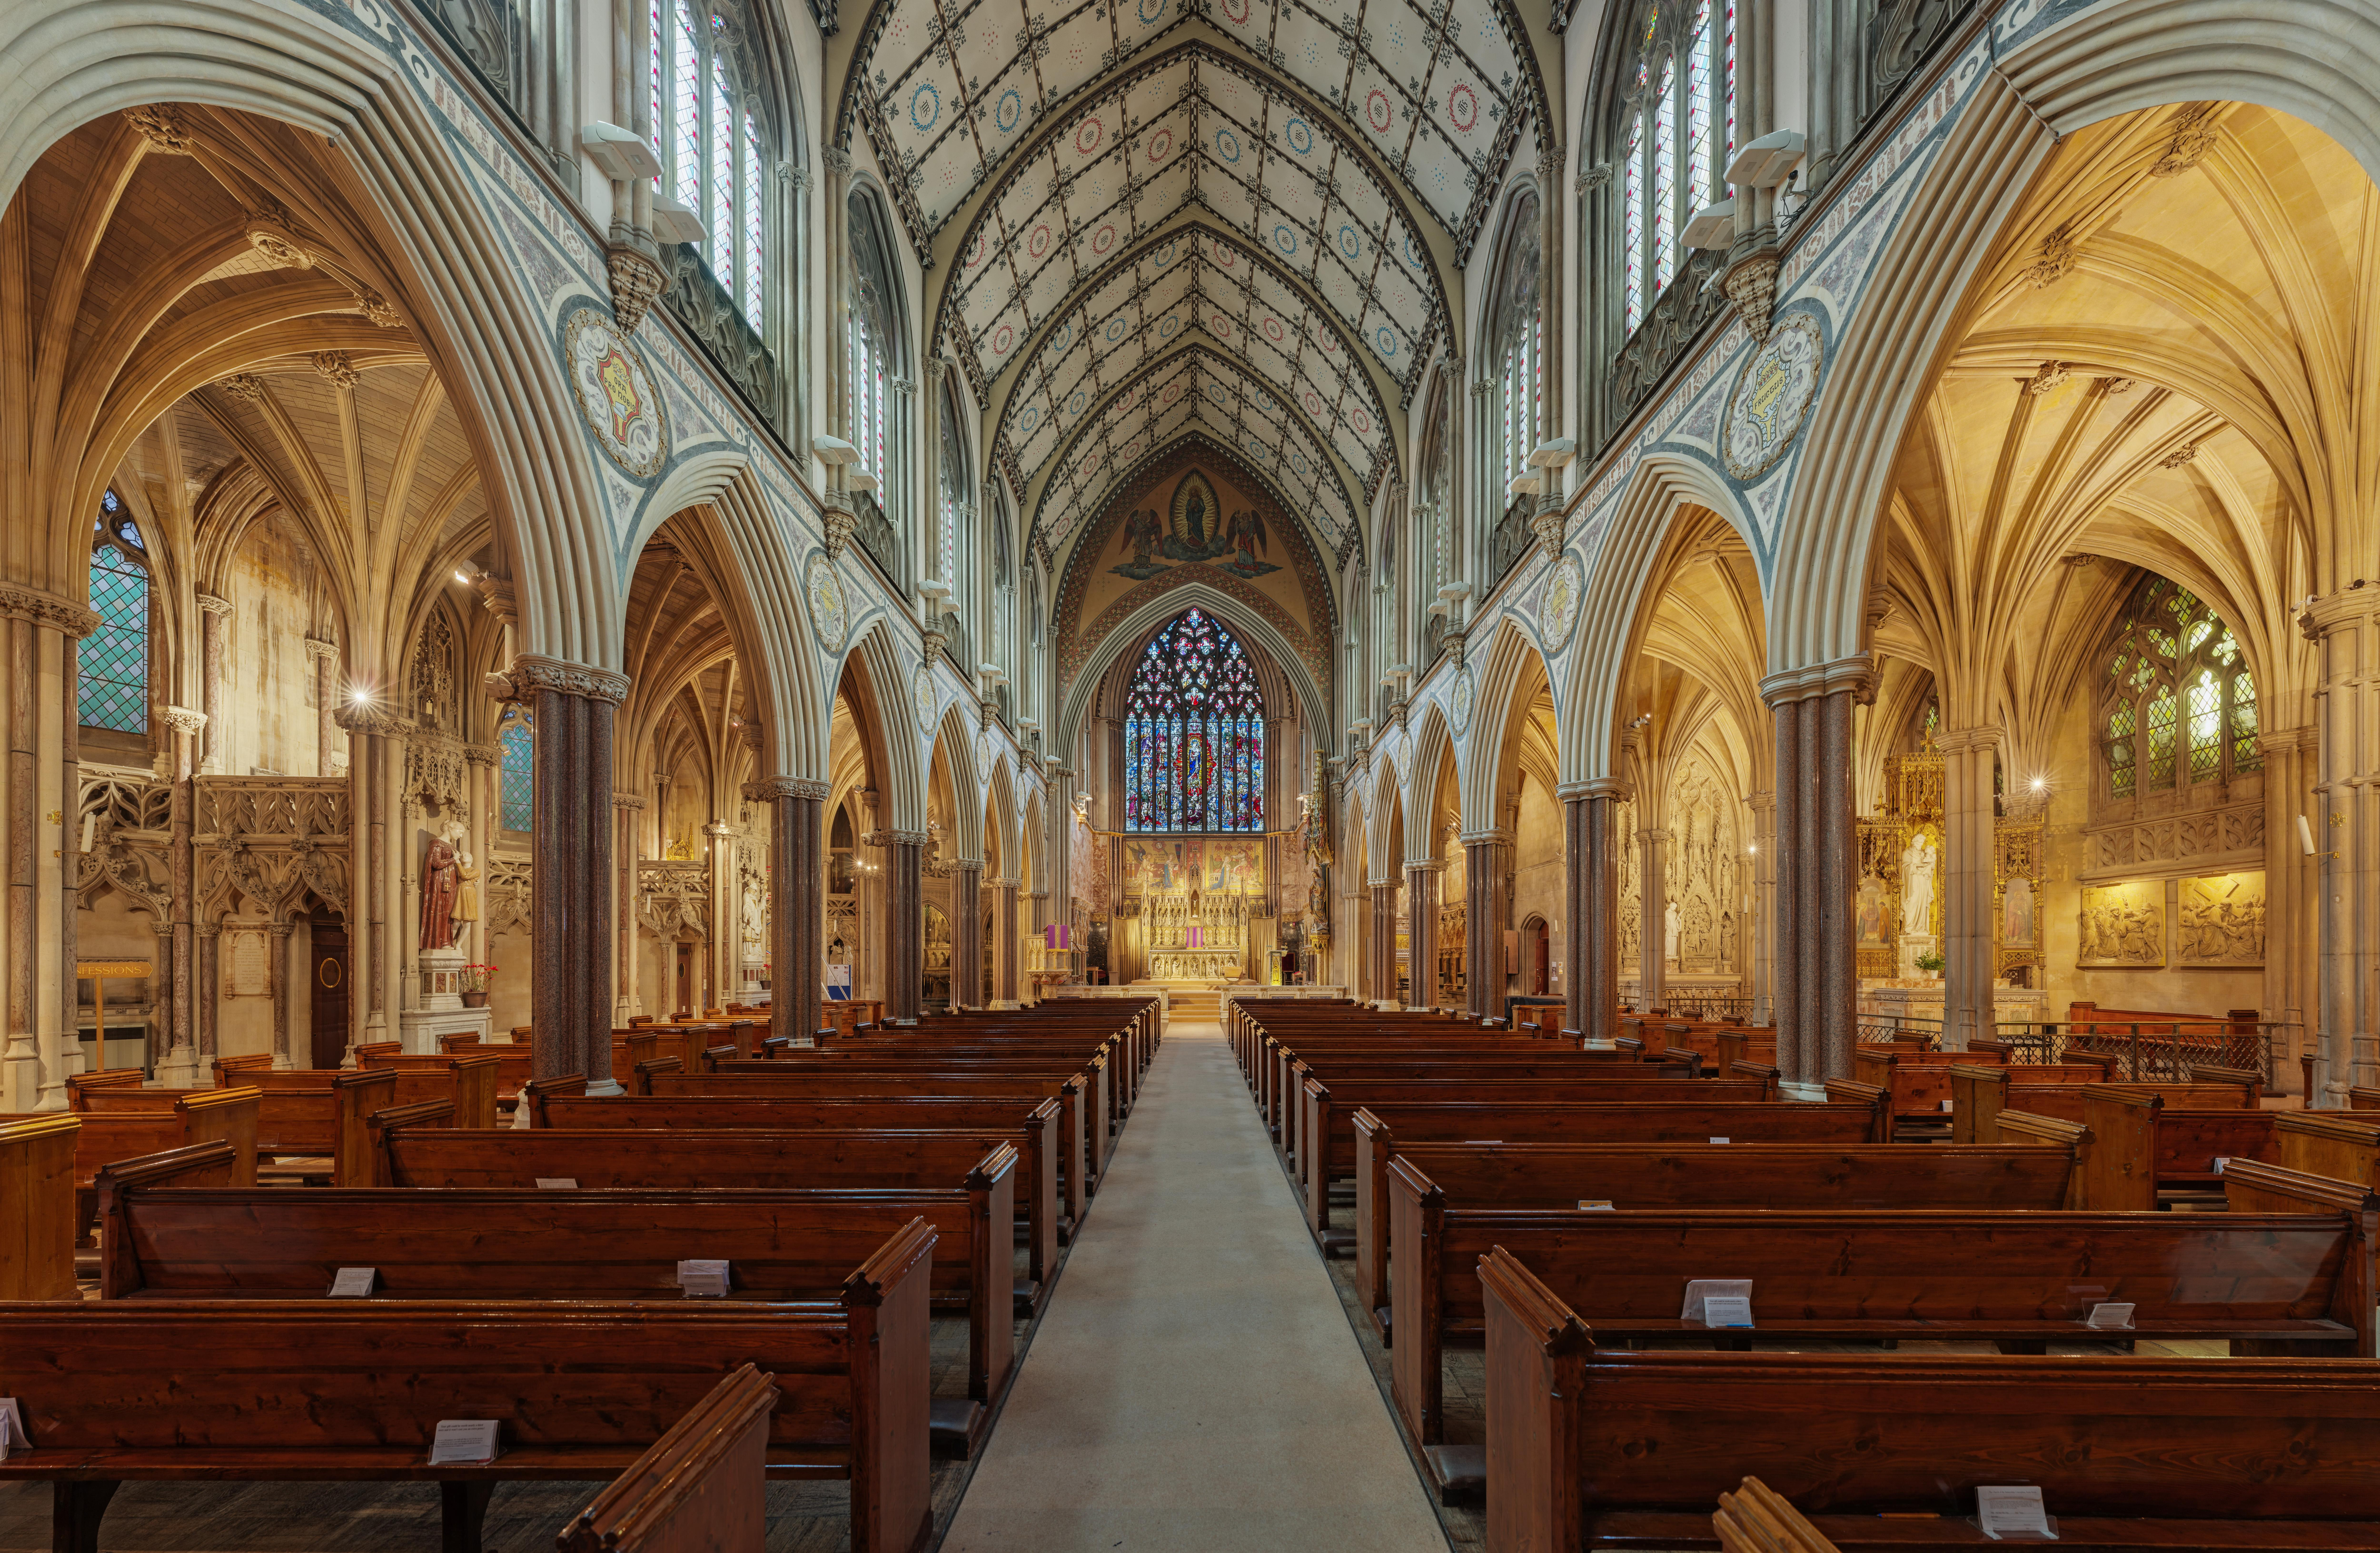 File:Immaculate Conception Church, Farm Street, London, UK - Diliff ...